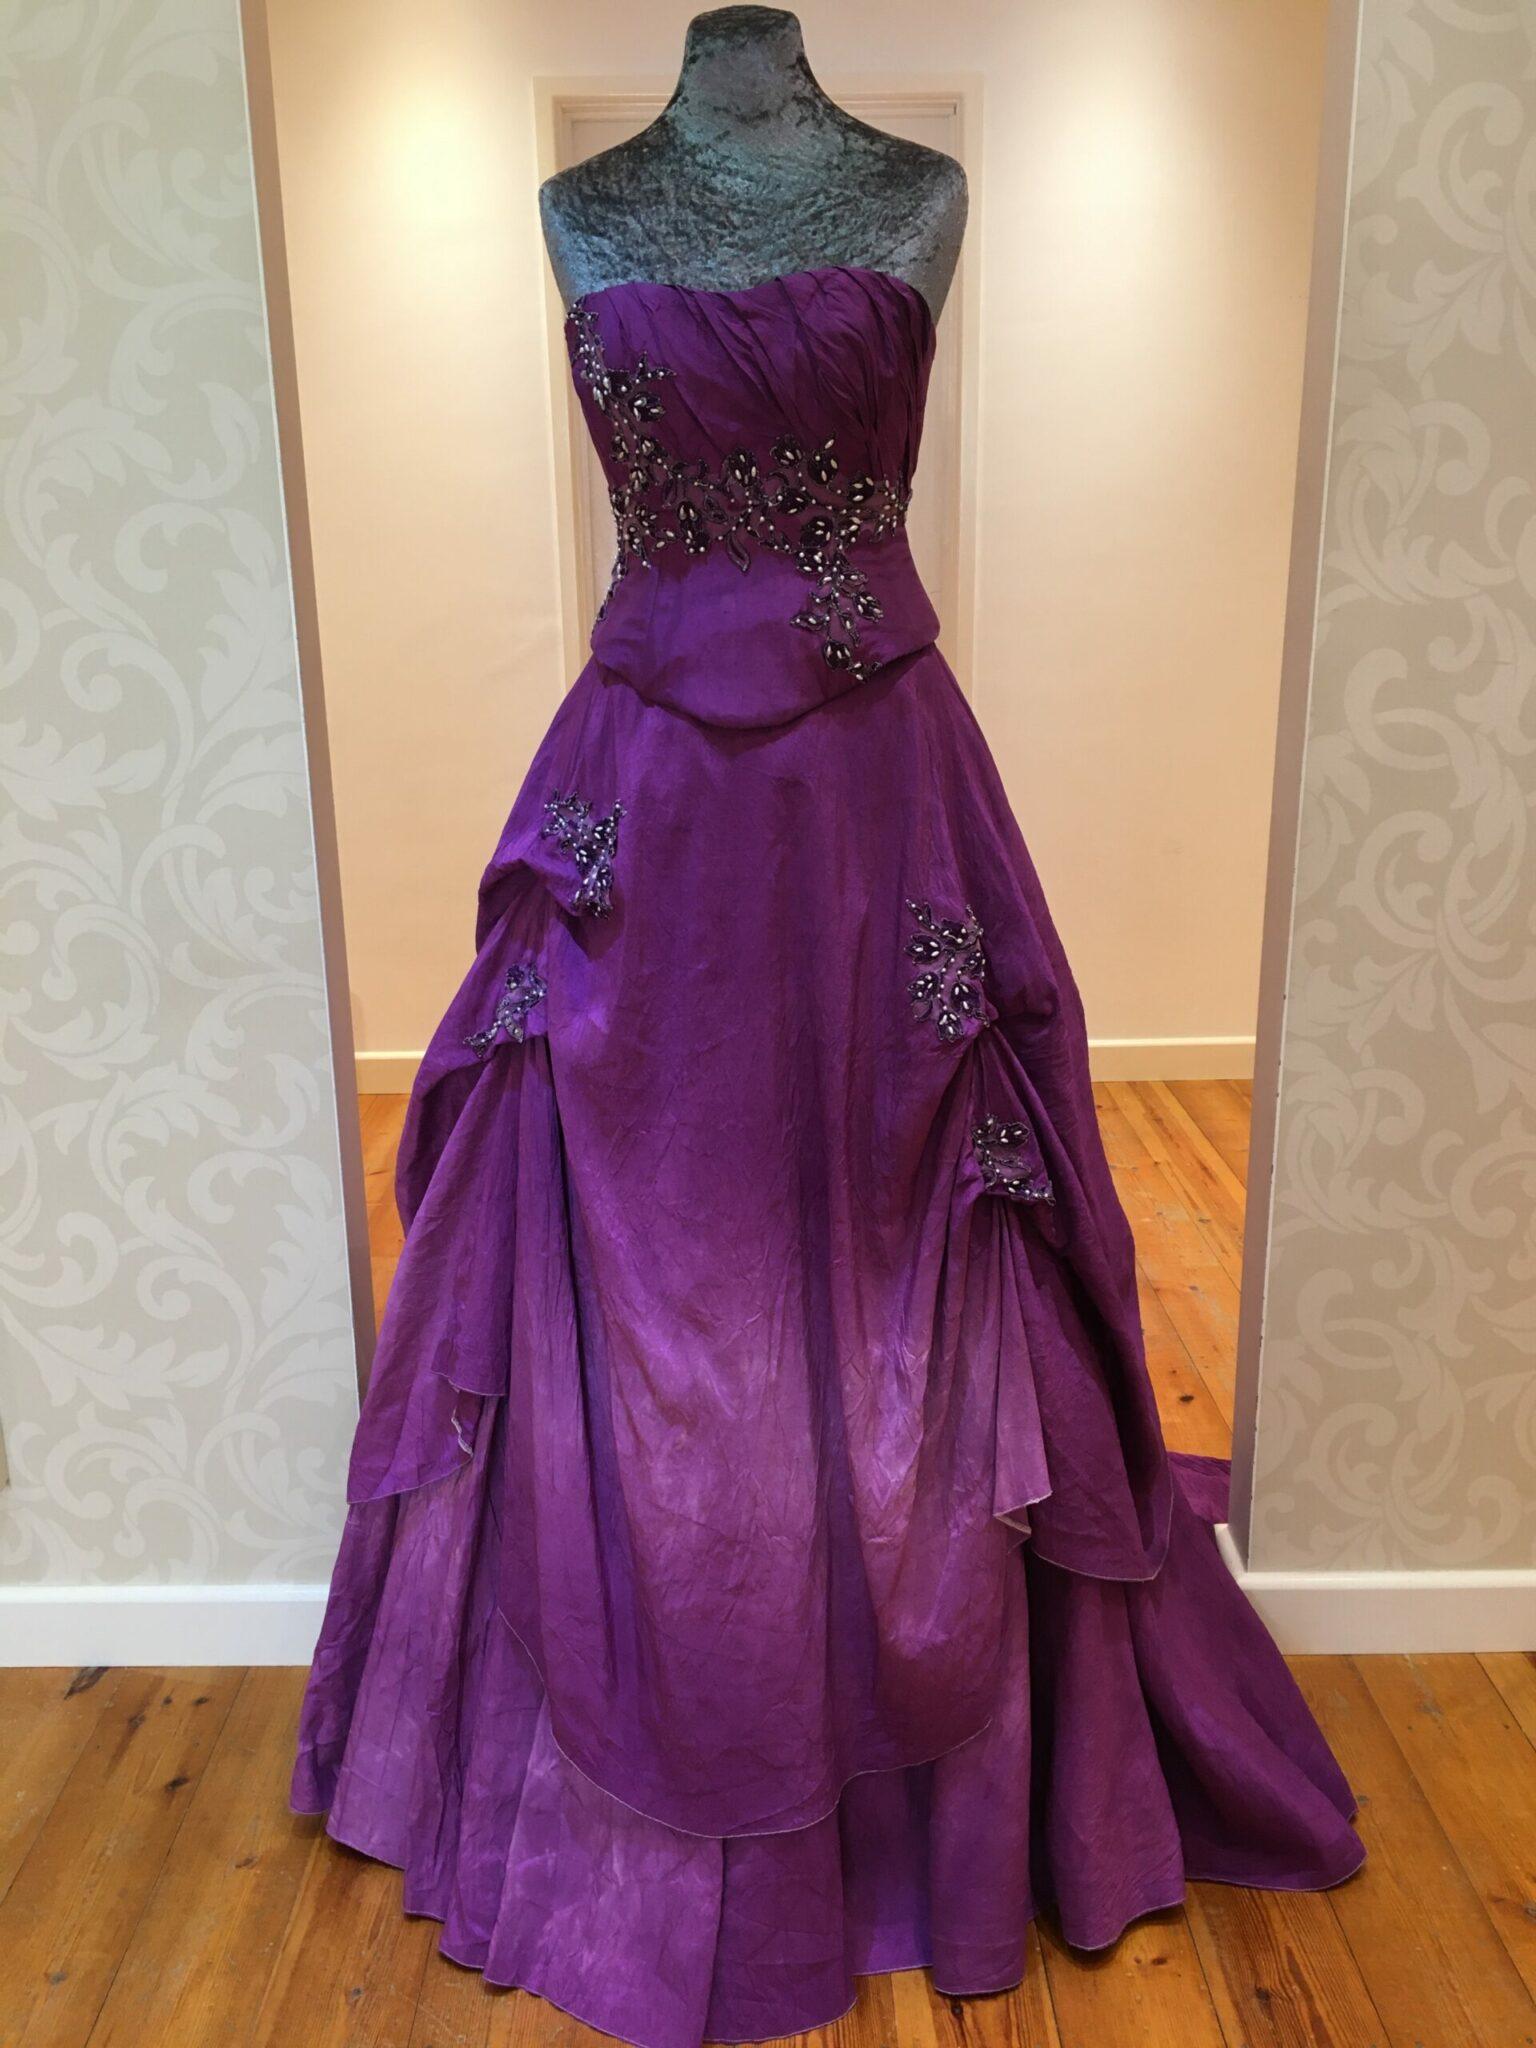 Vintage purple wedding gown